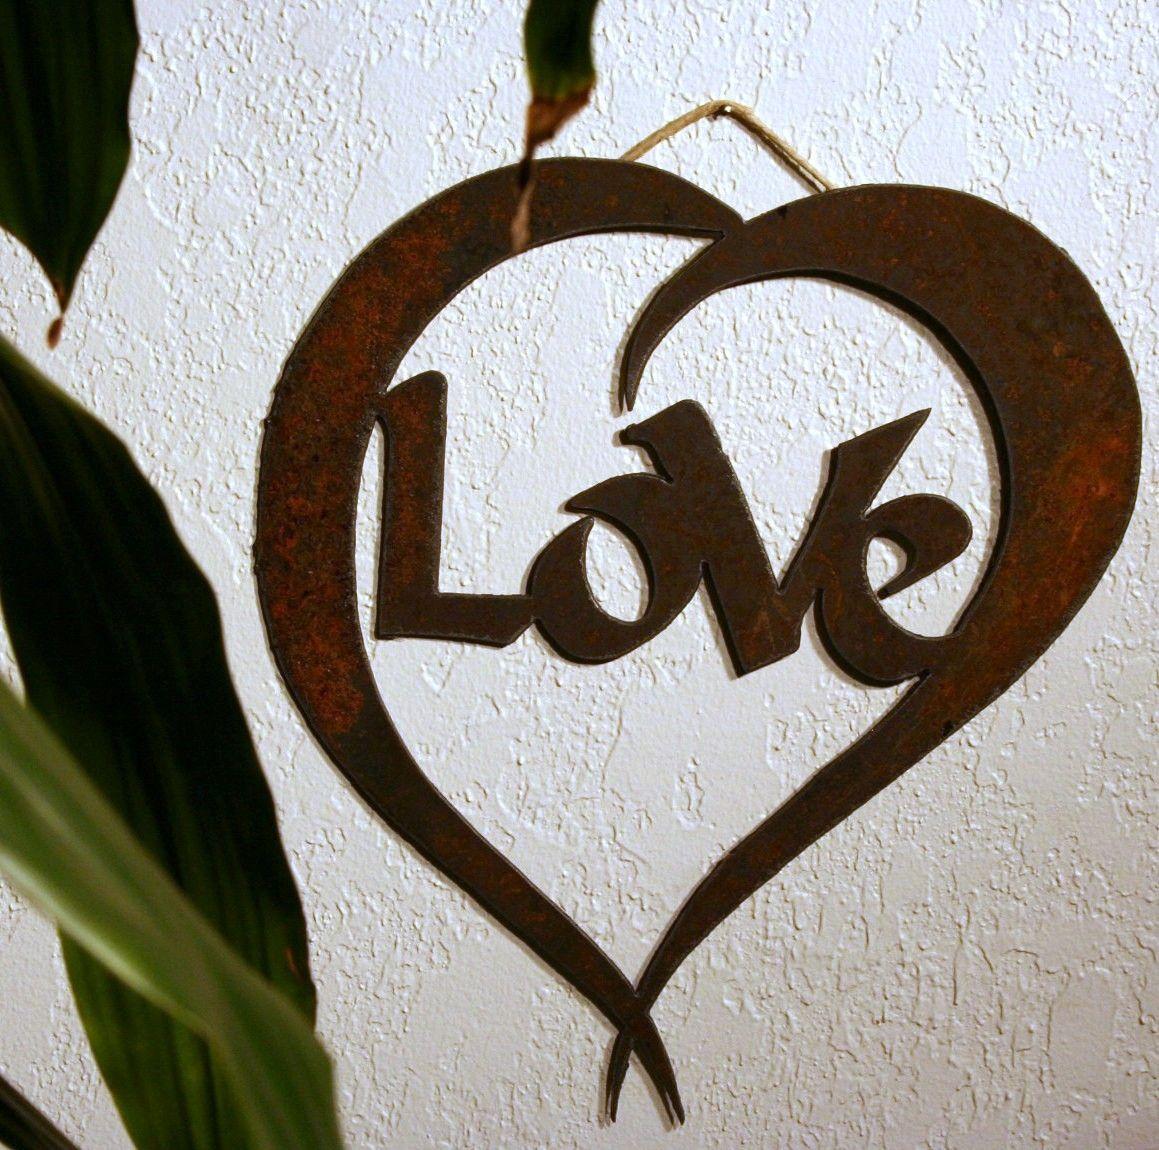 Love Rustic Heart Wall Decor 16 00 Via Etsy Heart Wall Decor Heart Wall Wall Decor